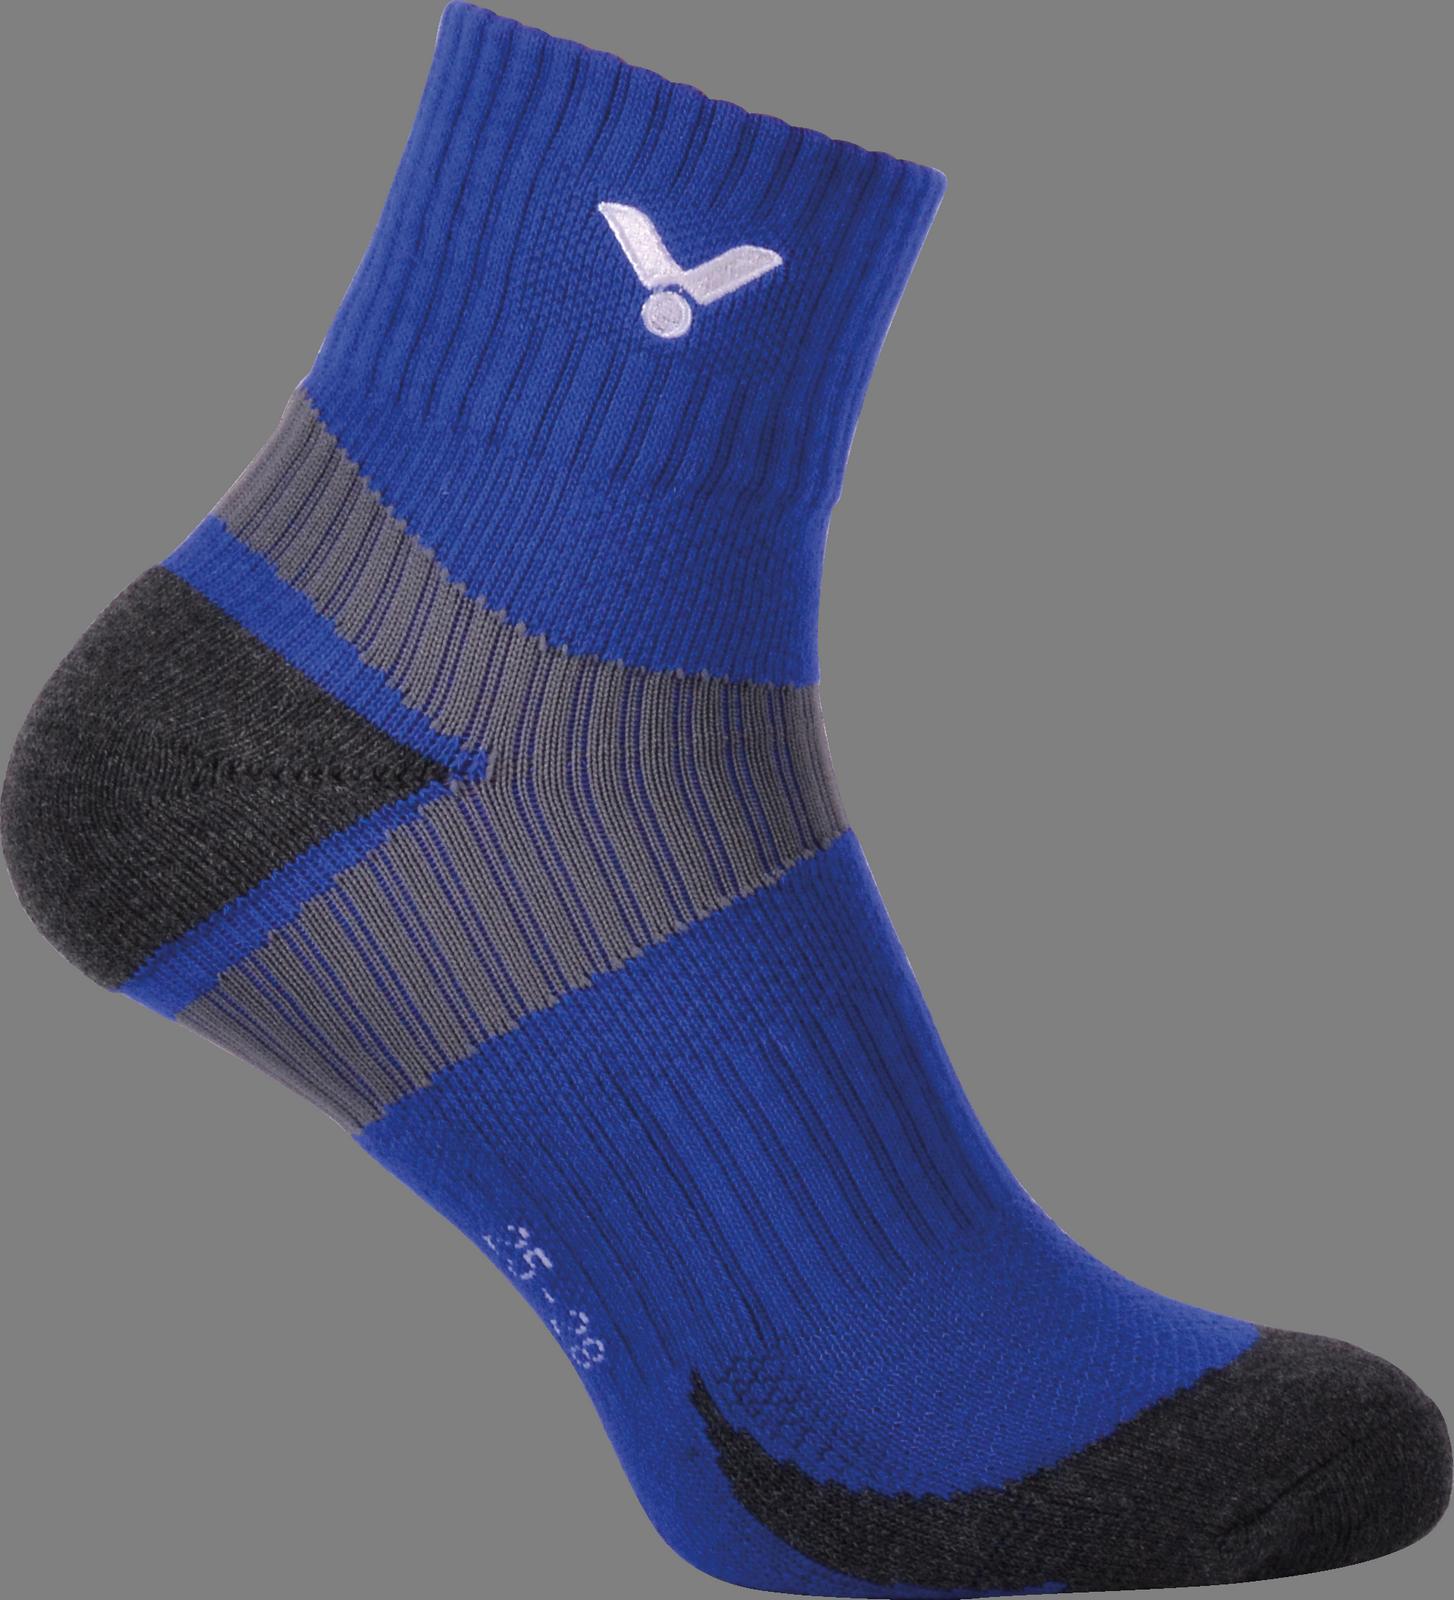 VICTOR Socks SK 139 blau